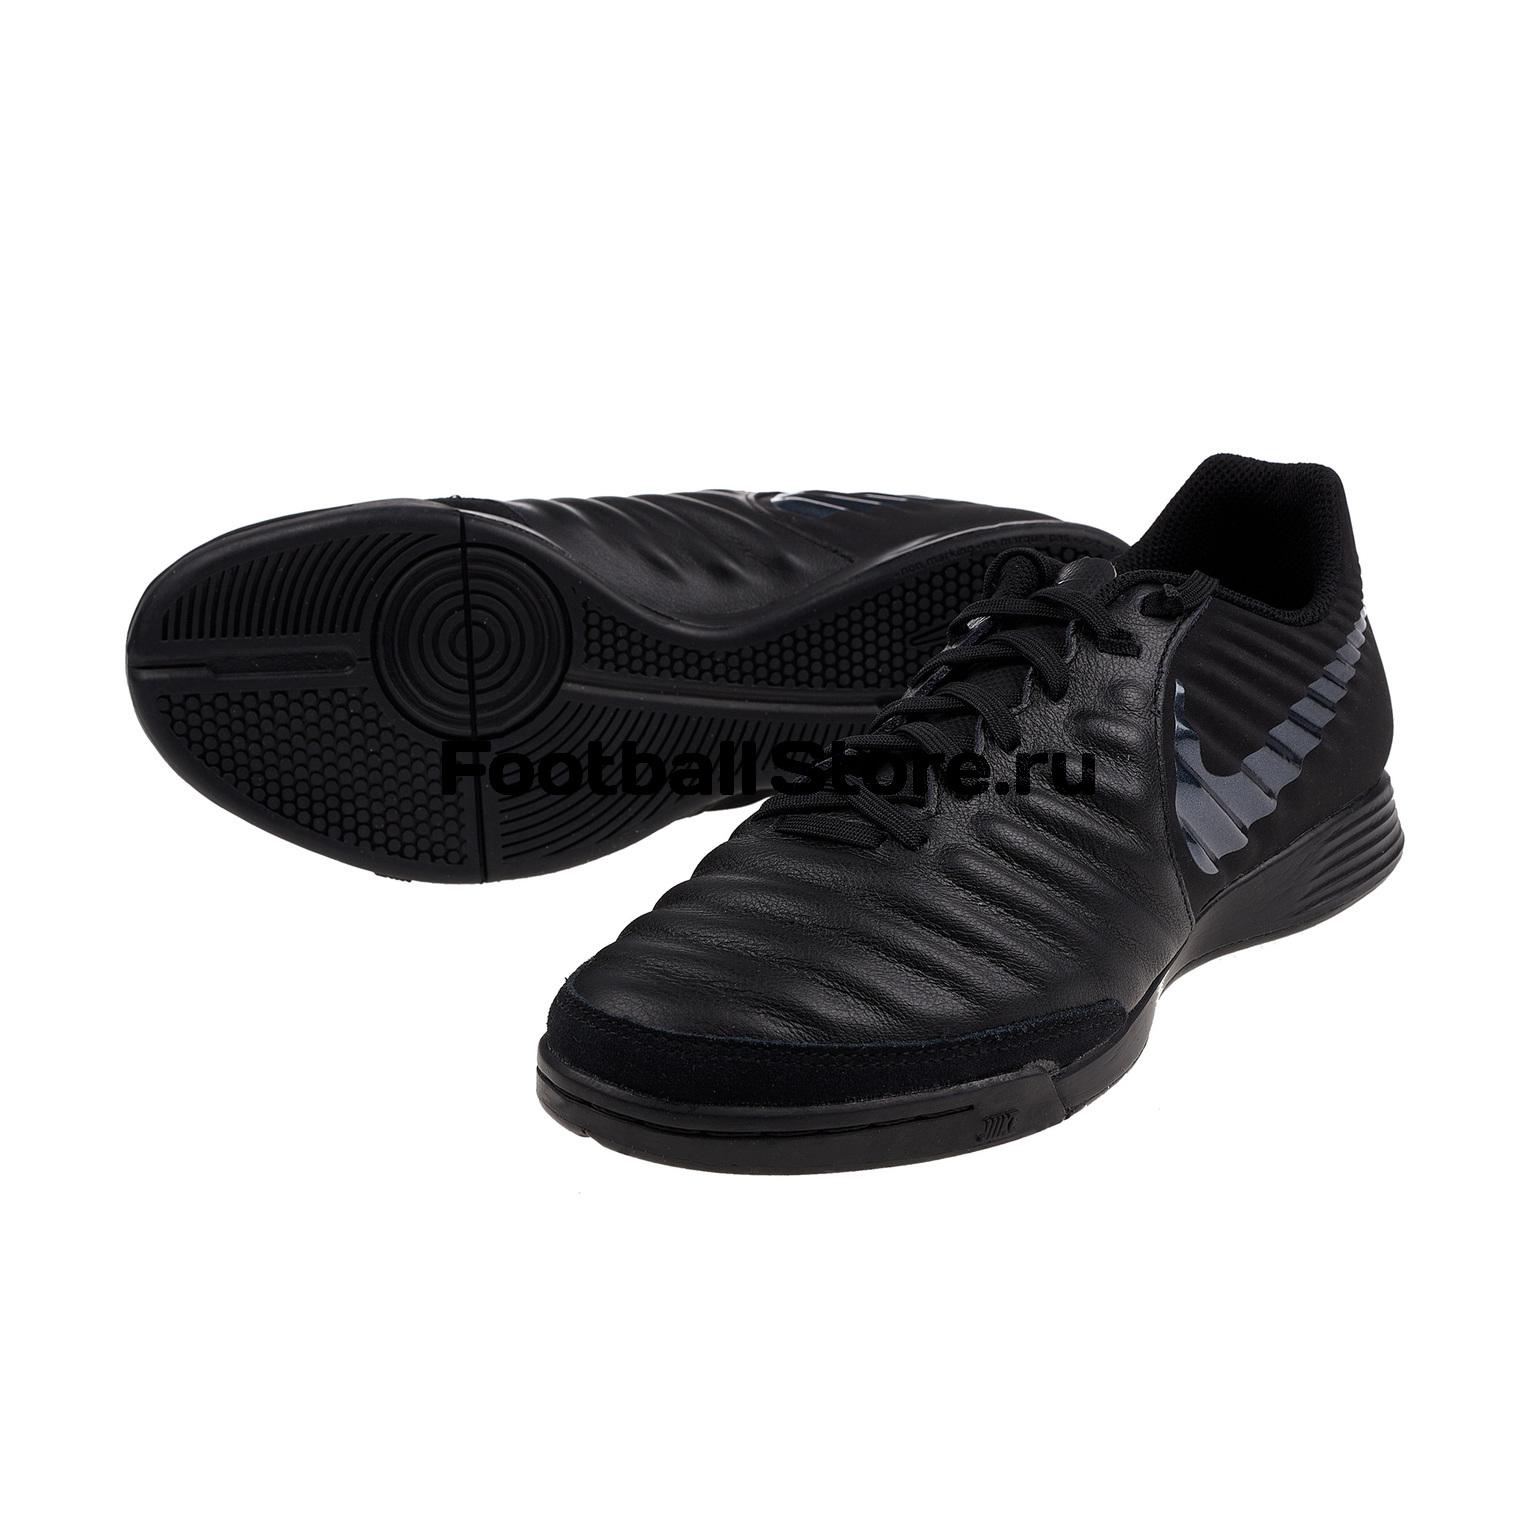 ... Nike LegendX 7 Academy IC AH7244-001. О ТОВАРЕ  РАСЧЕТ ДОСТАВКИ 2e67df36d36f4